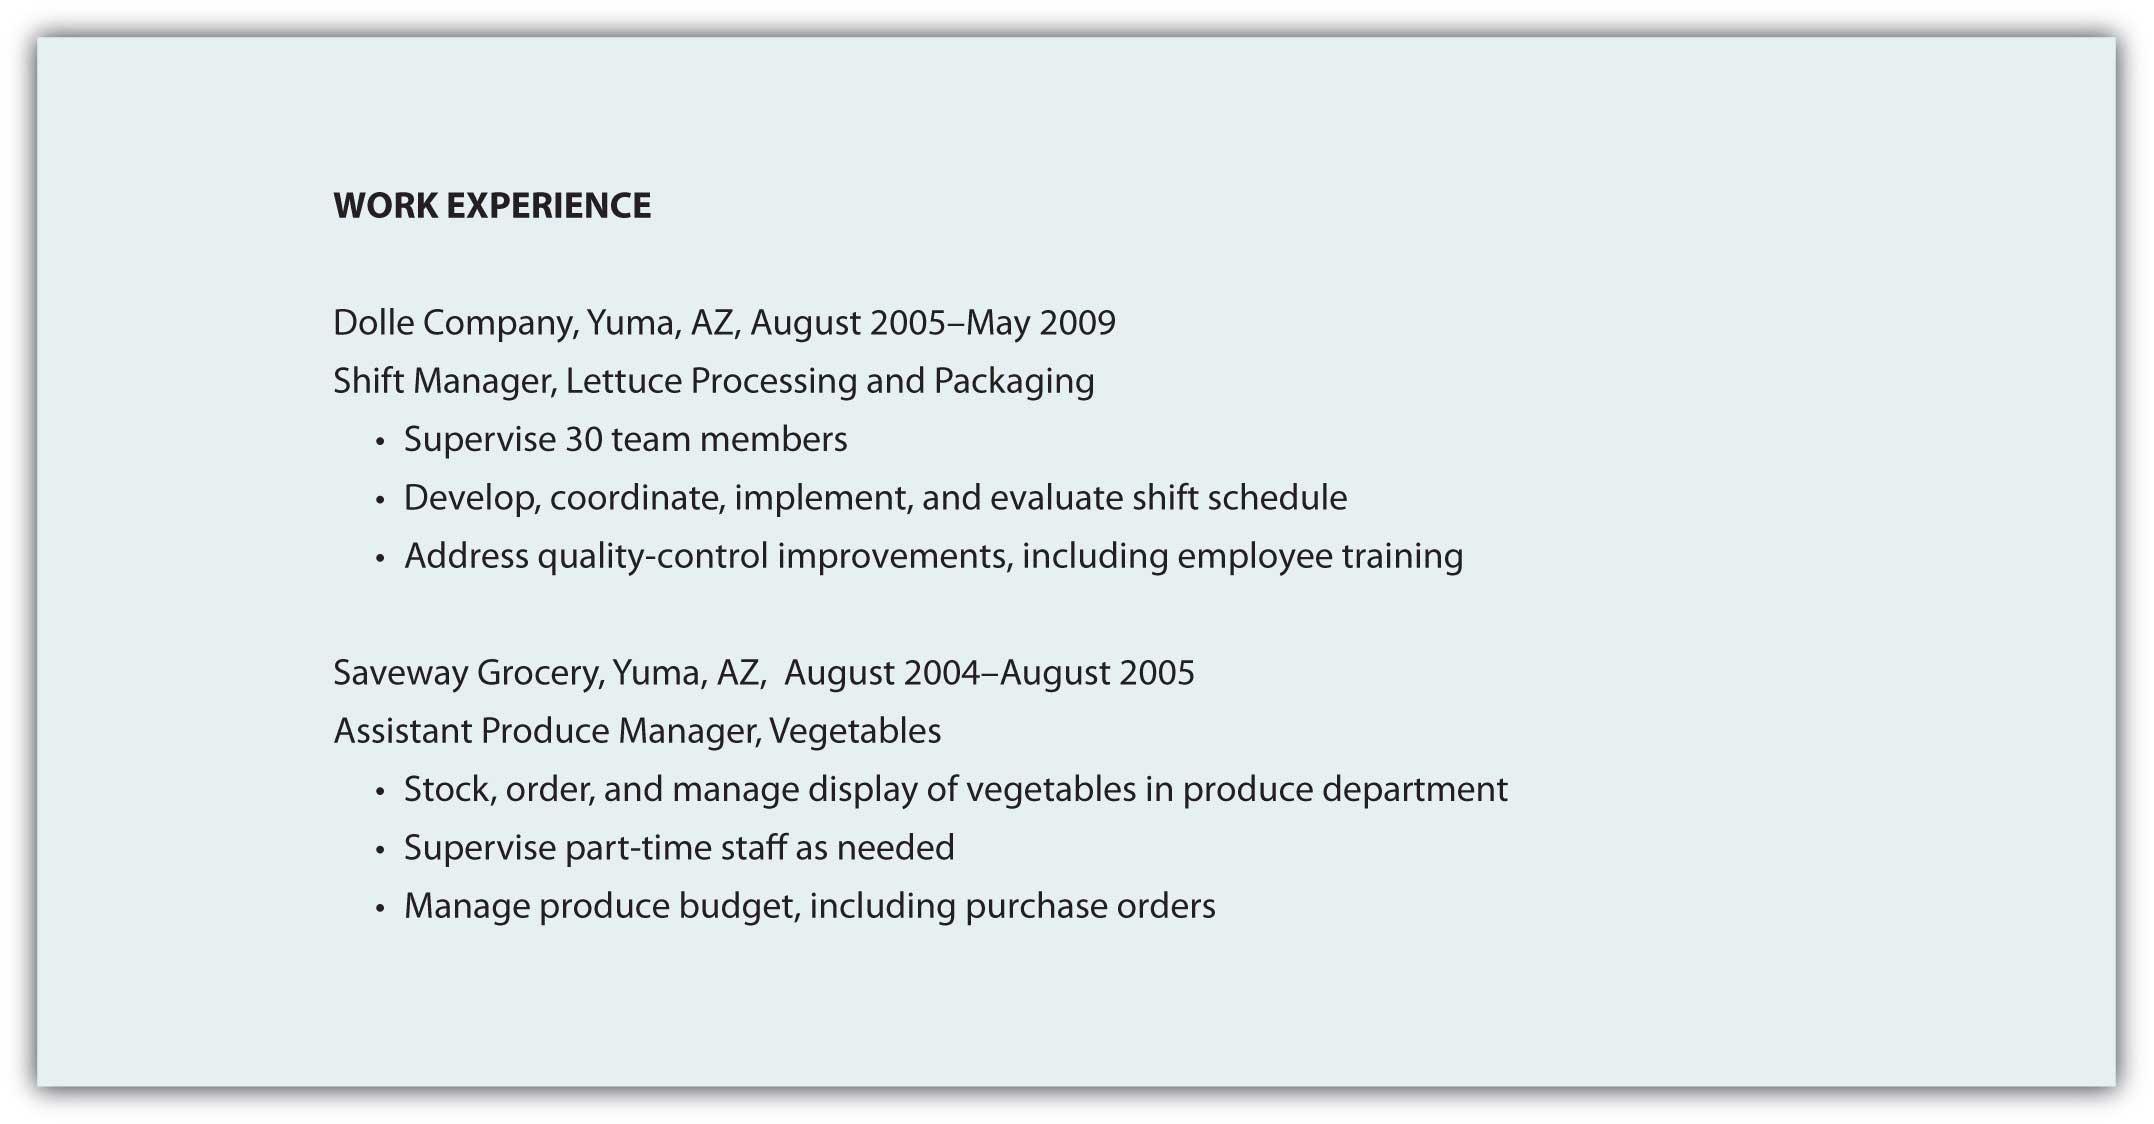 Job Experiences